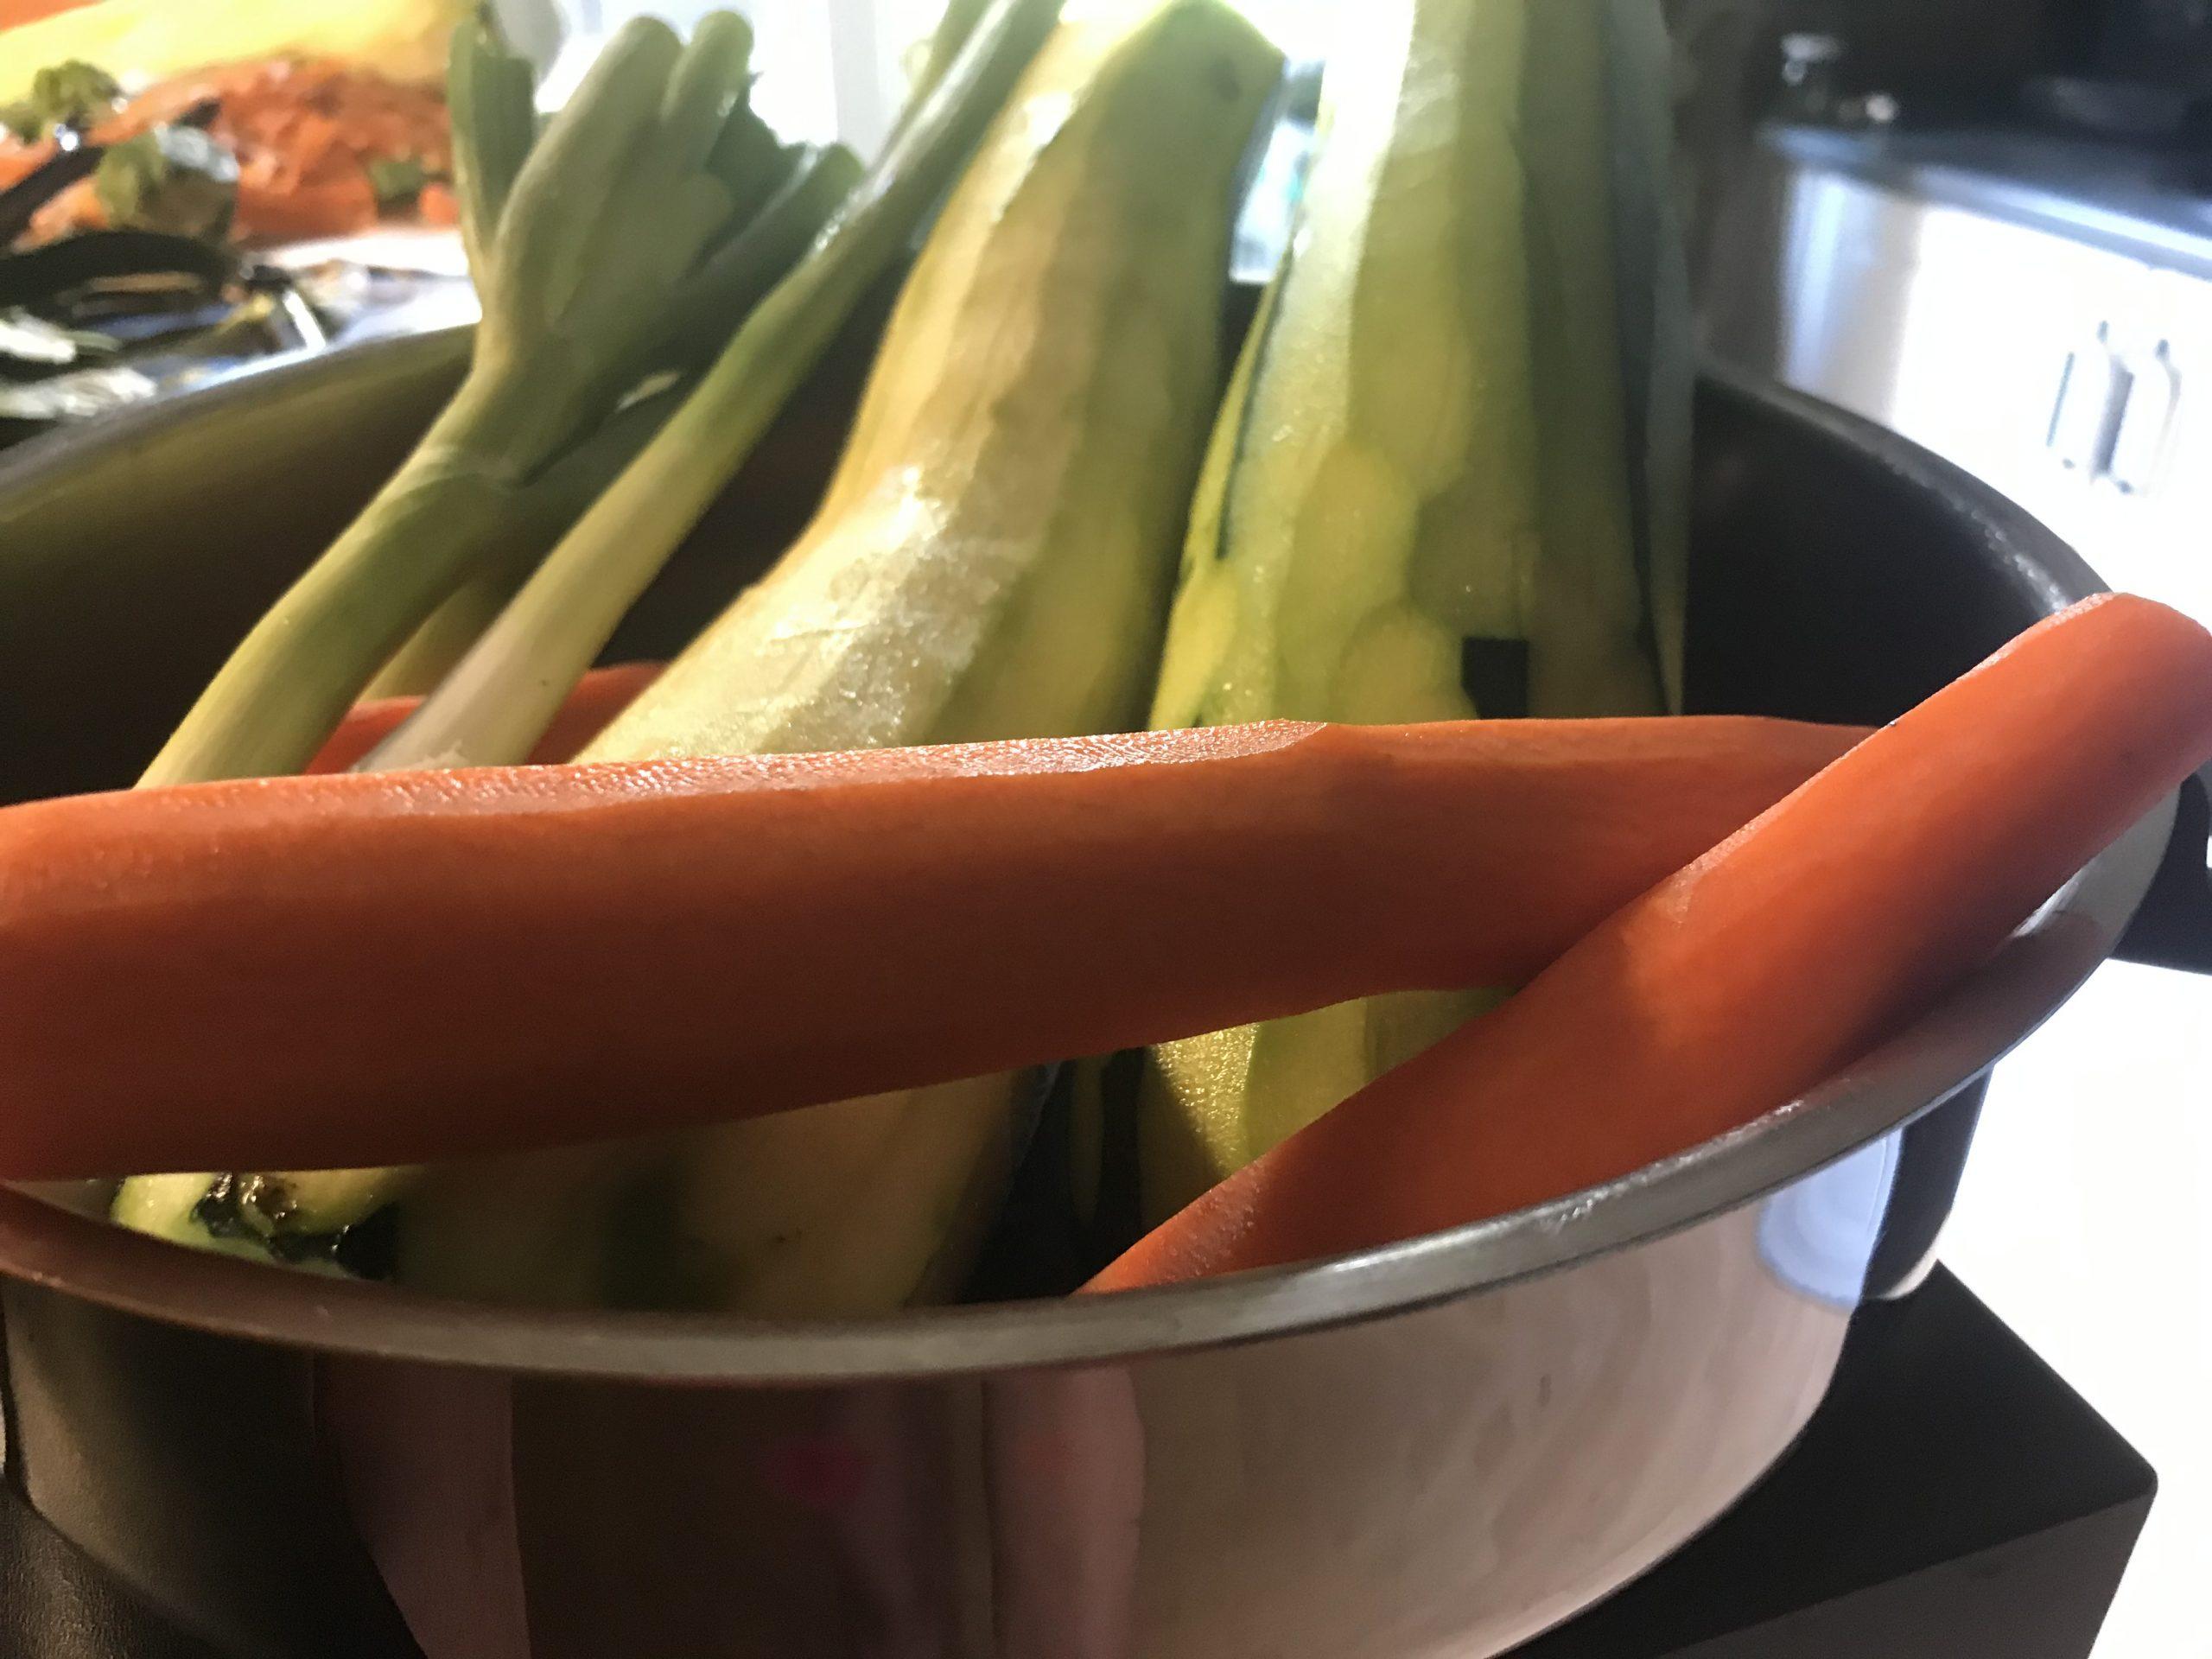 Zeleninové palacinky na slano zcukety amrkvy - príprava